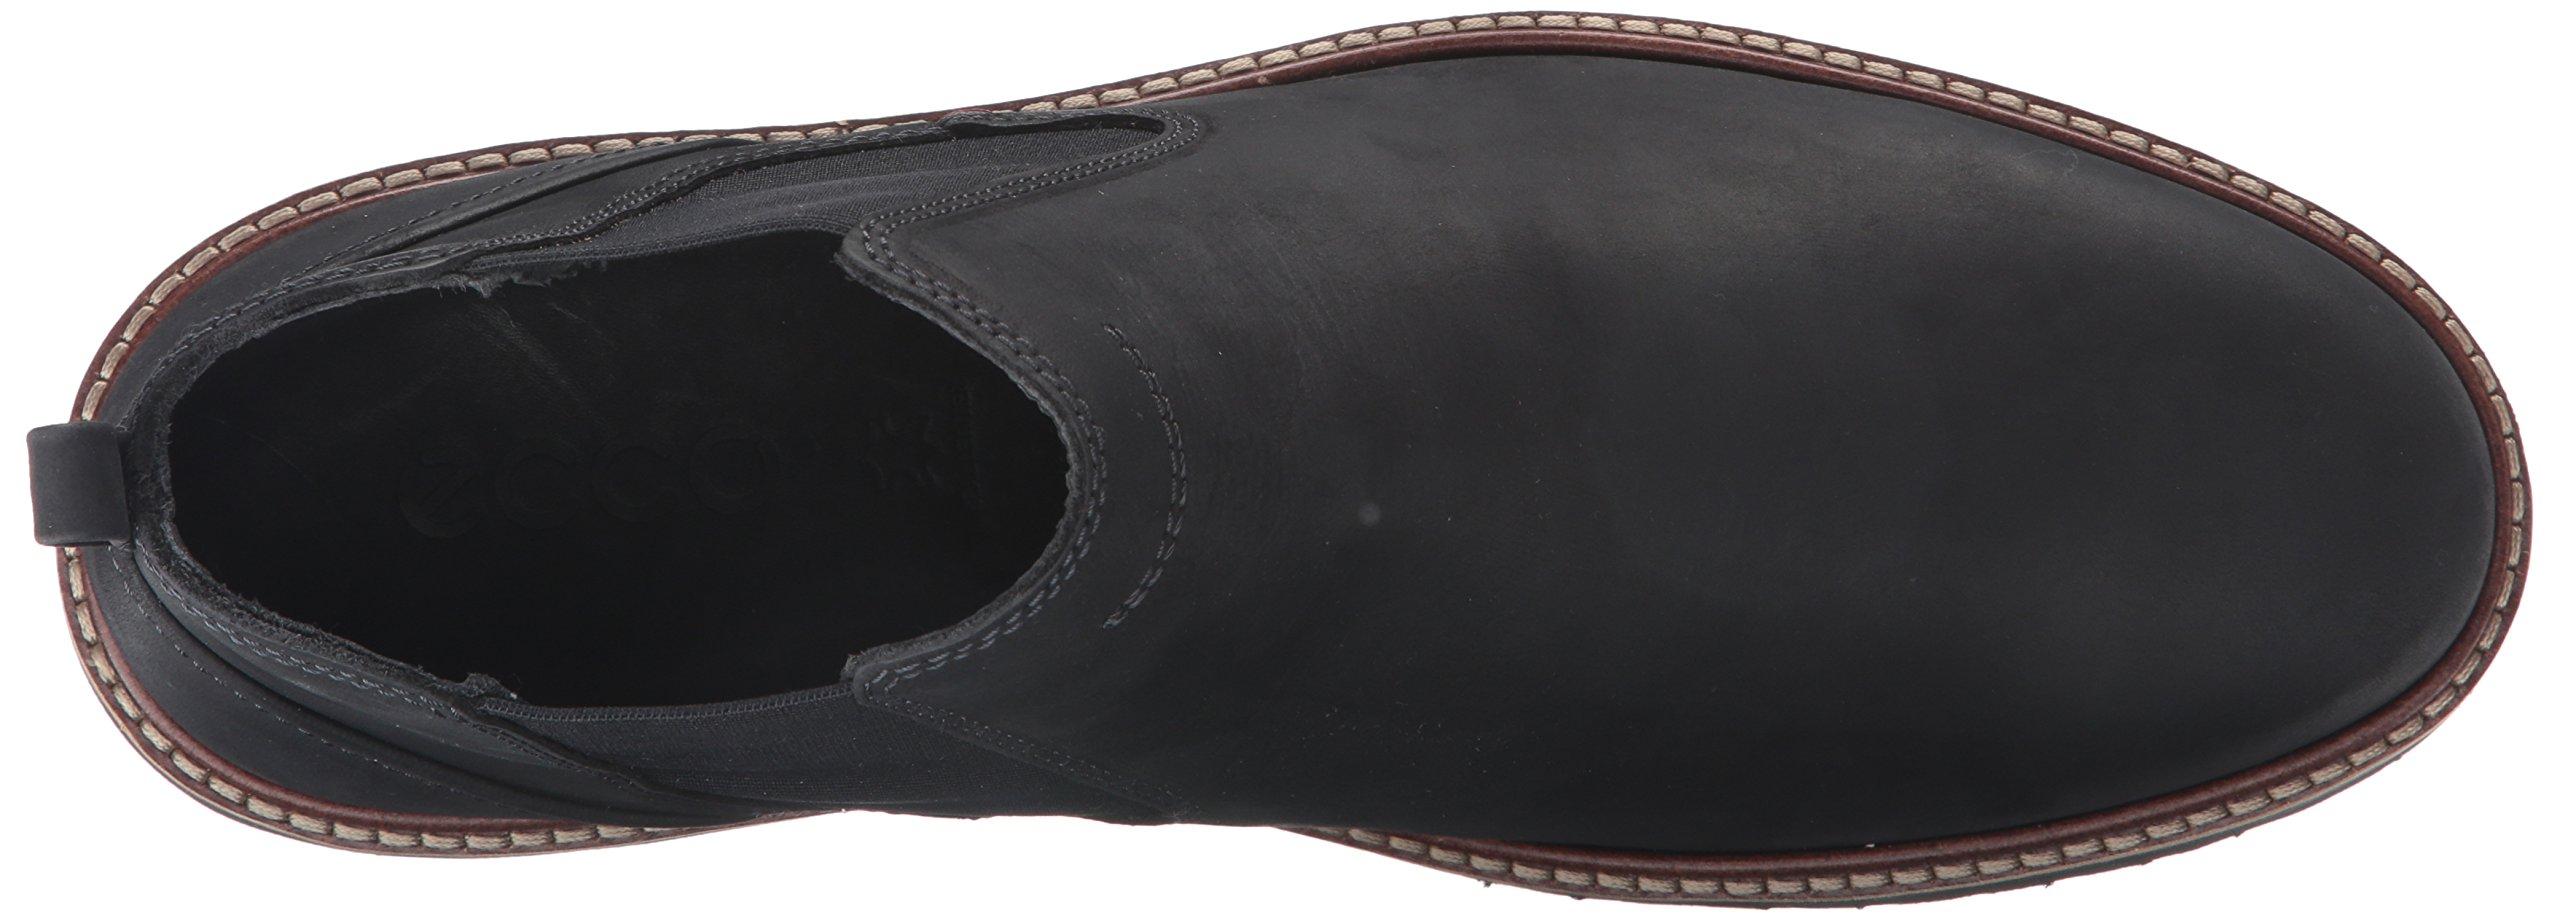 ECCO Men's Ian Chukka Boot, Black, 43 EU/9-9.5 M US by ECCO (Image #8)